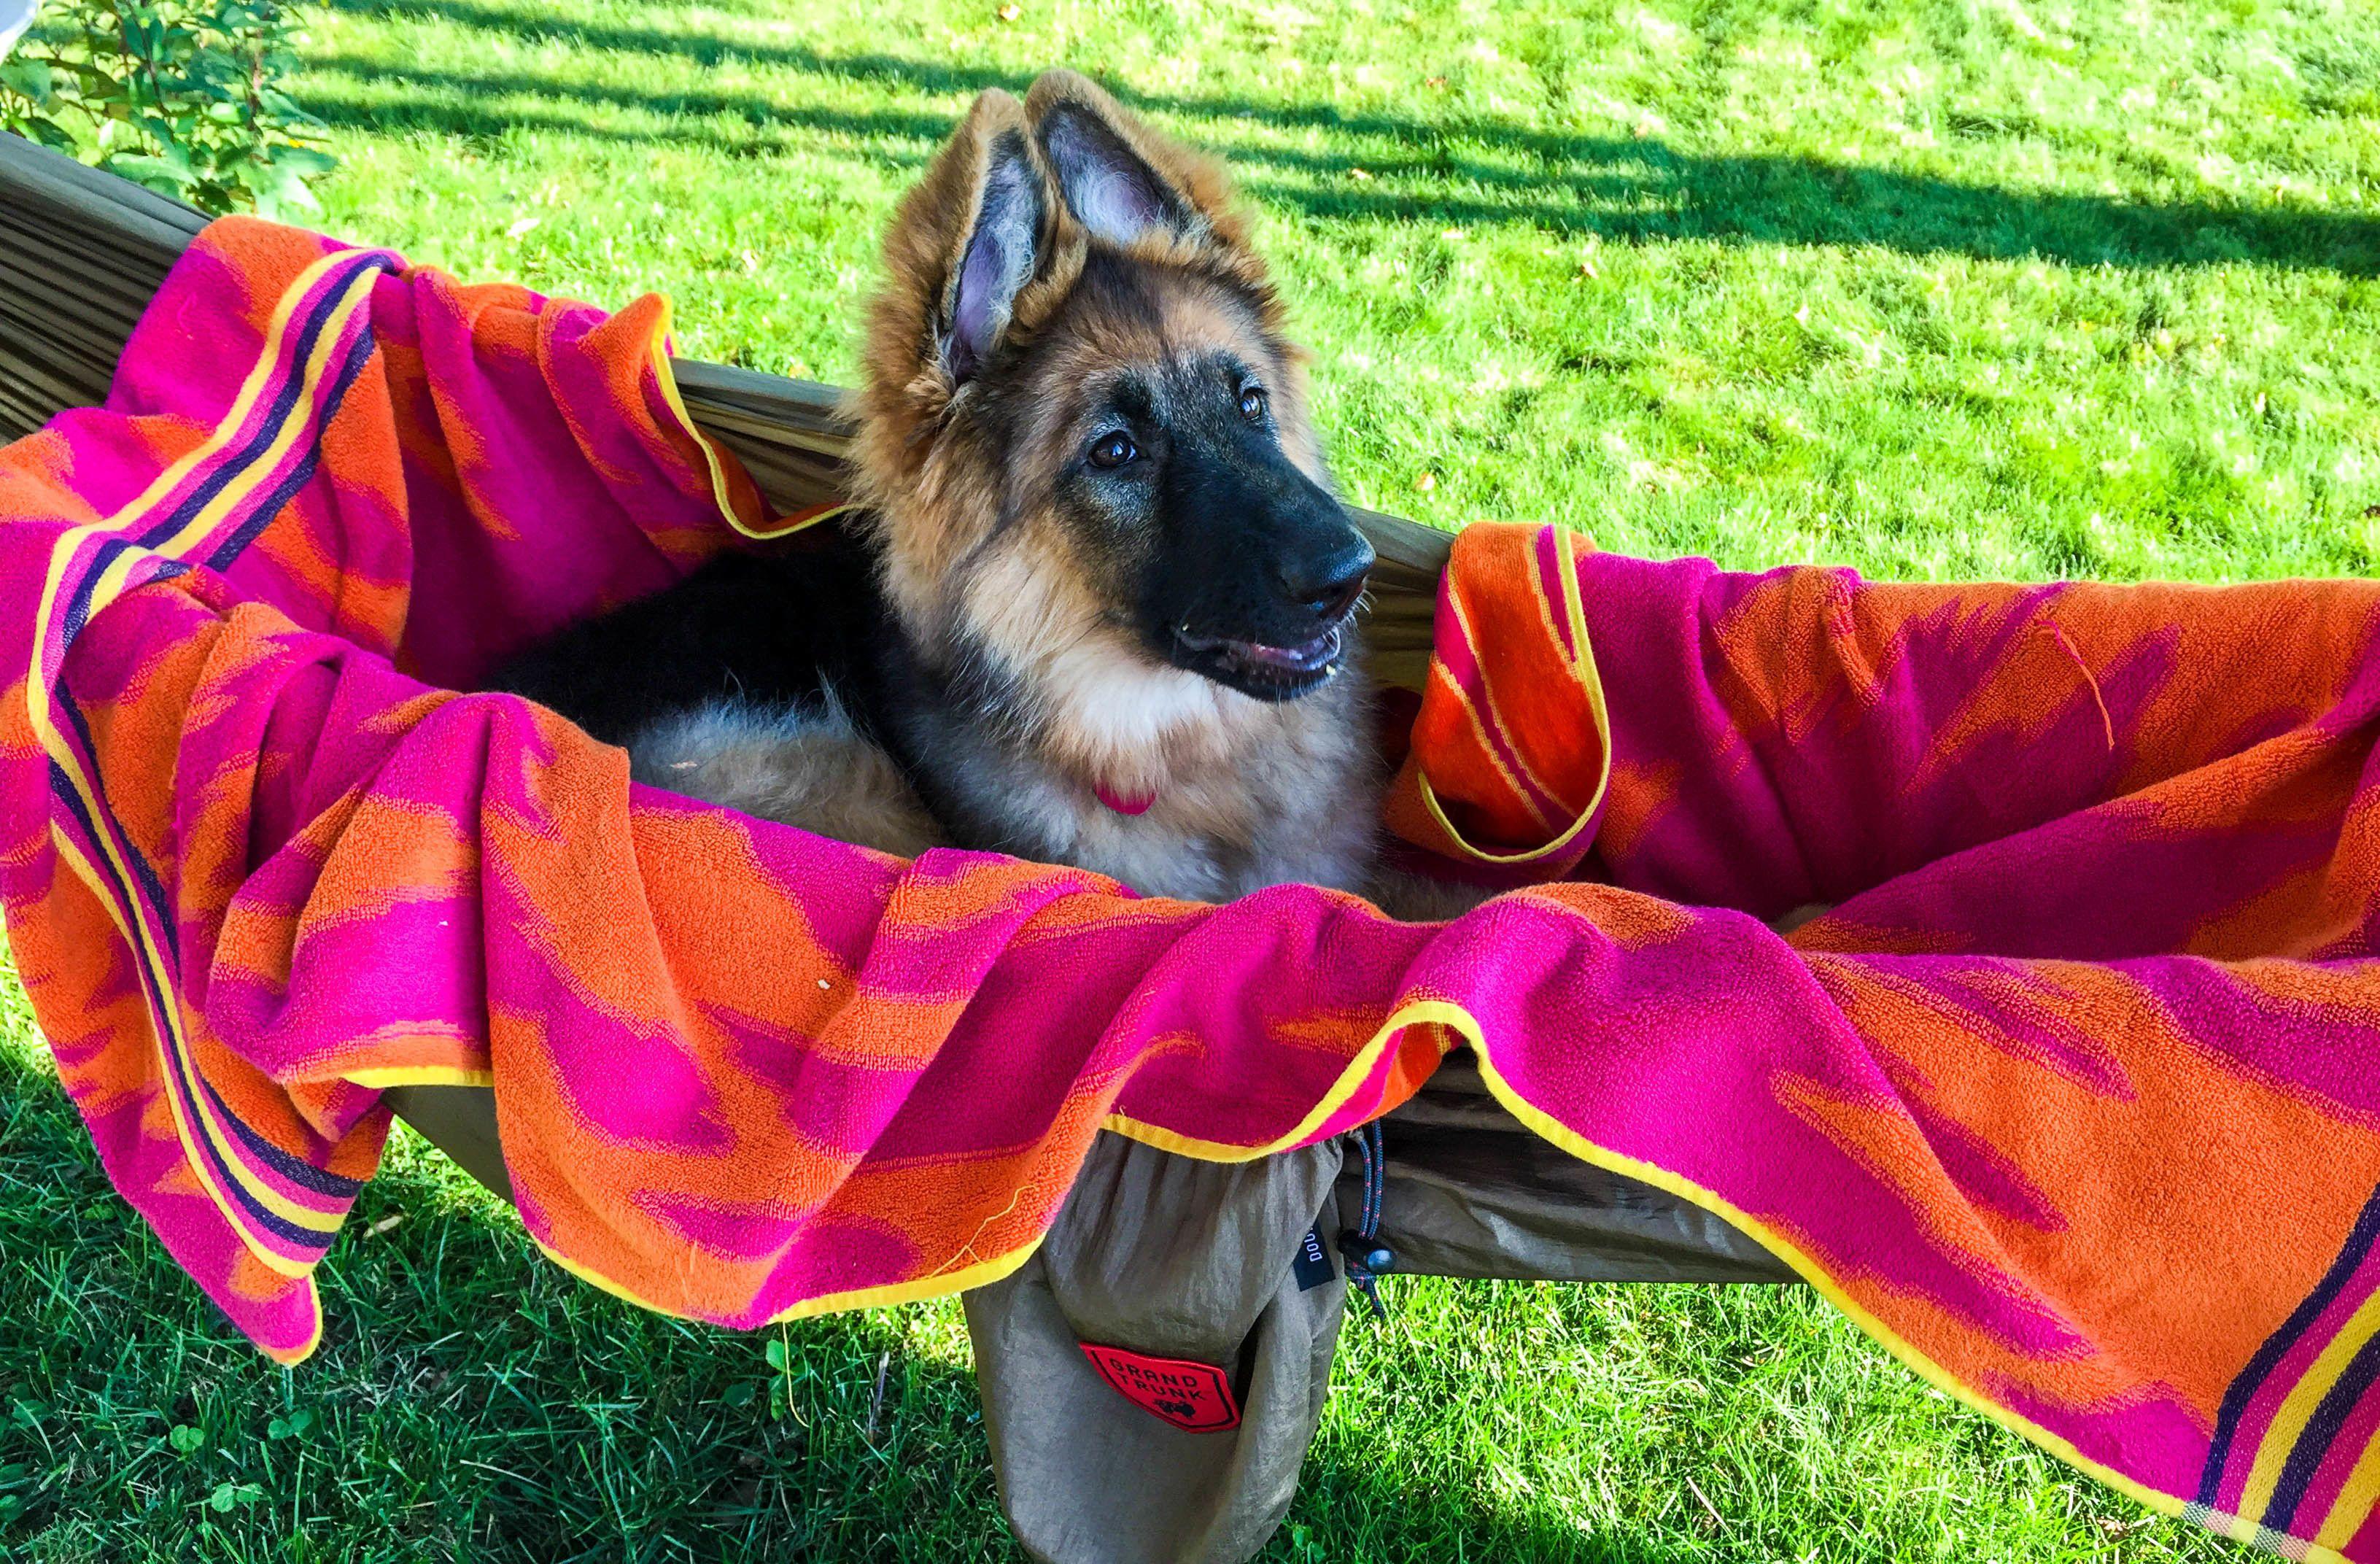 madera ixlib dog rb dogs with blogs camping outdoor photo hammock news hammocks